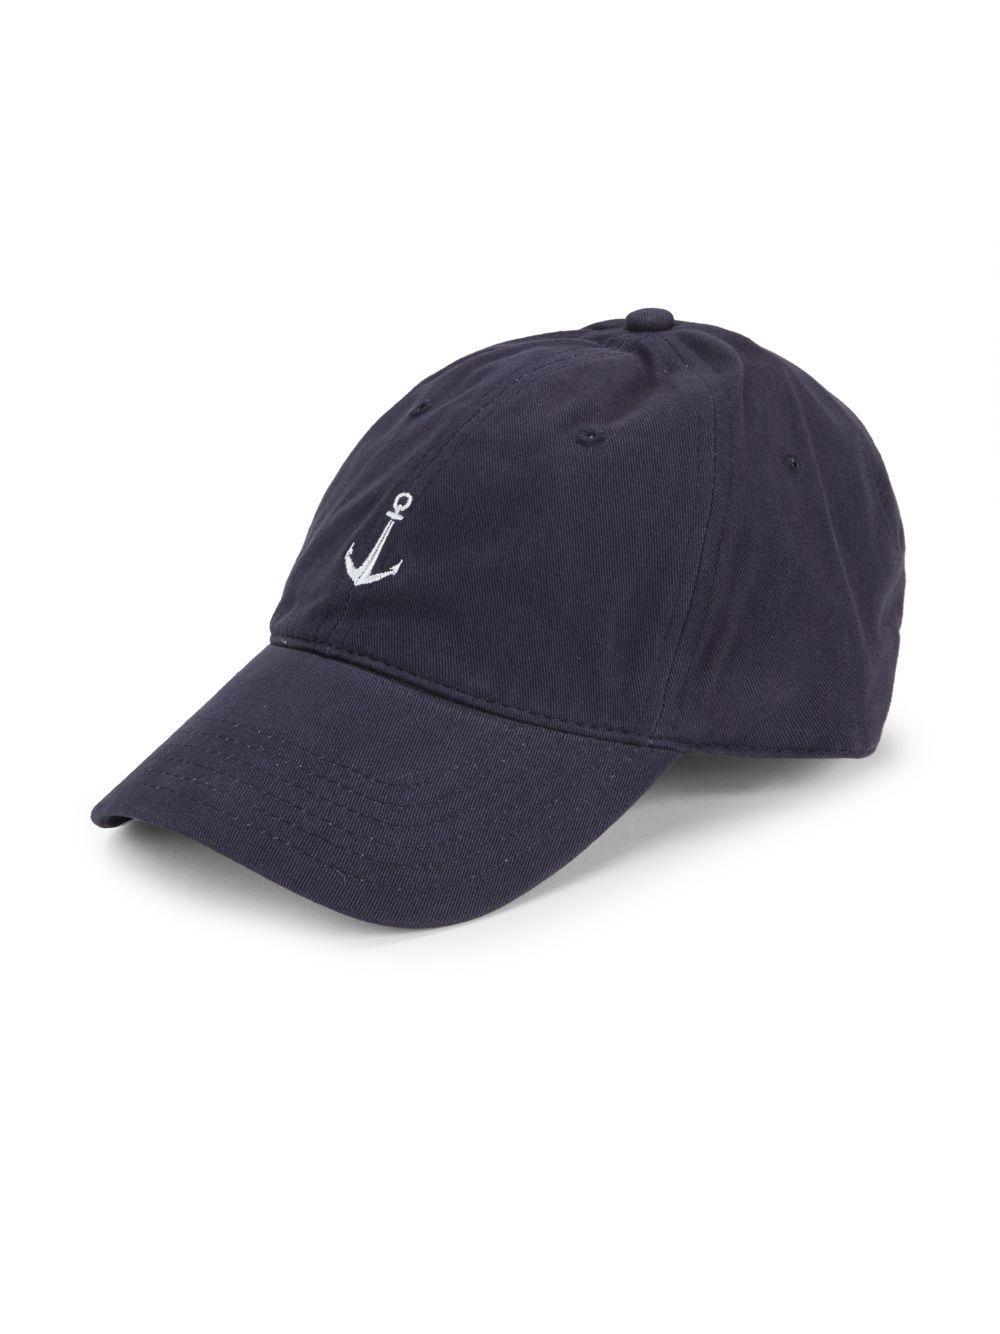 Lyst - Block Headwear Anchor Embroidered Cotton Baseball Cap in Blue ... 82d57331145a